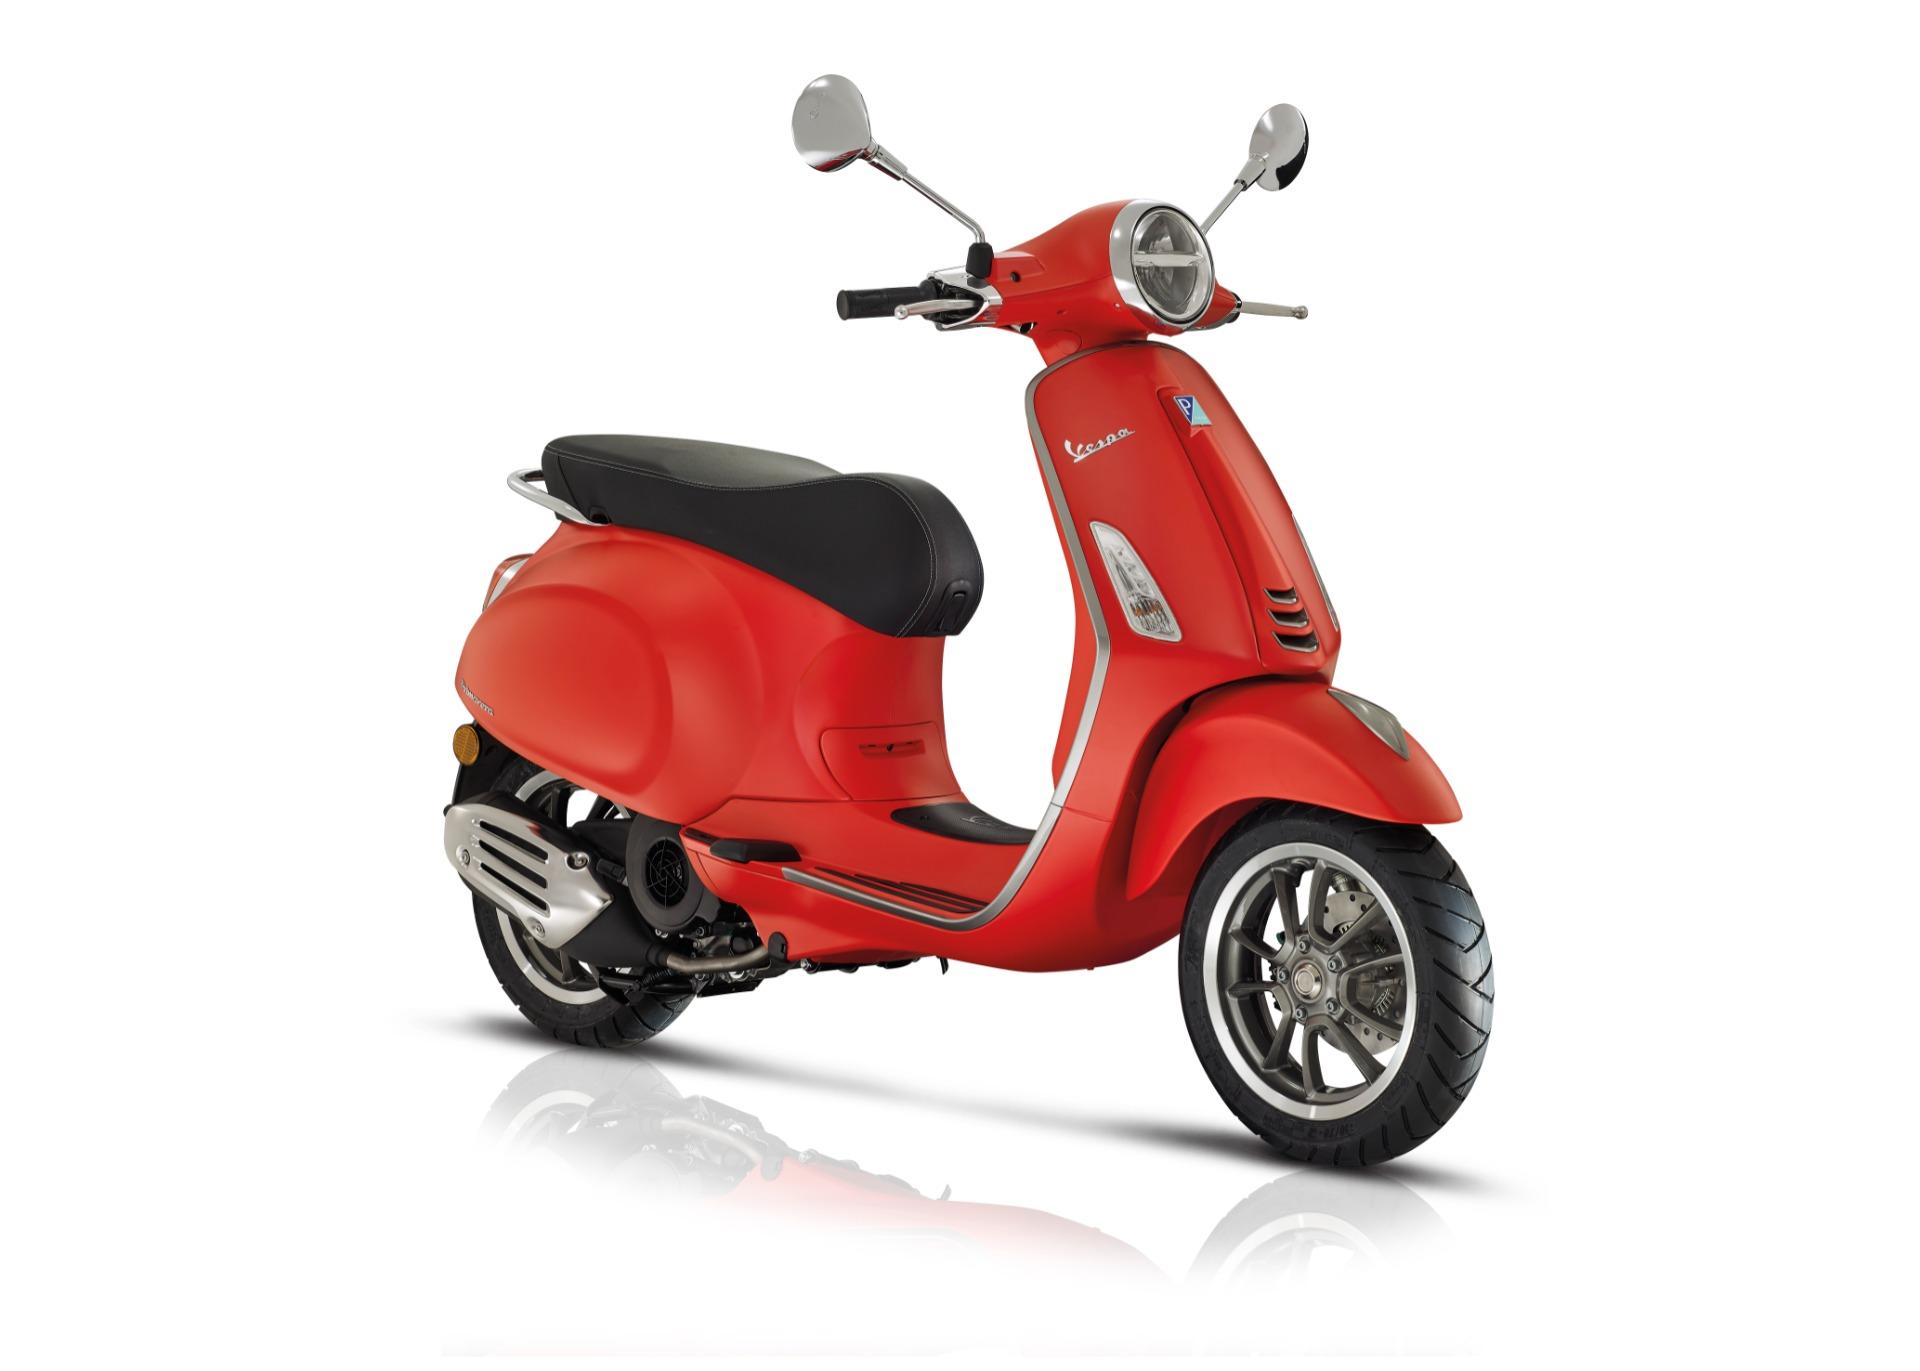 New-2019-Vespa-Primavera-50